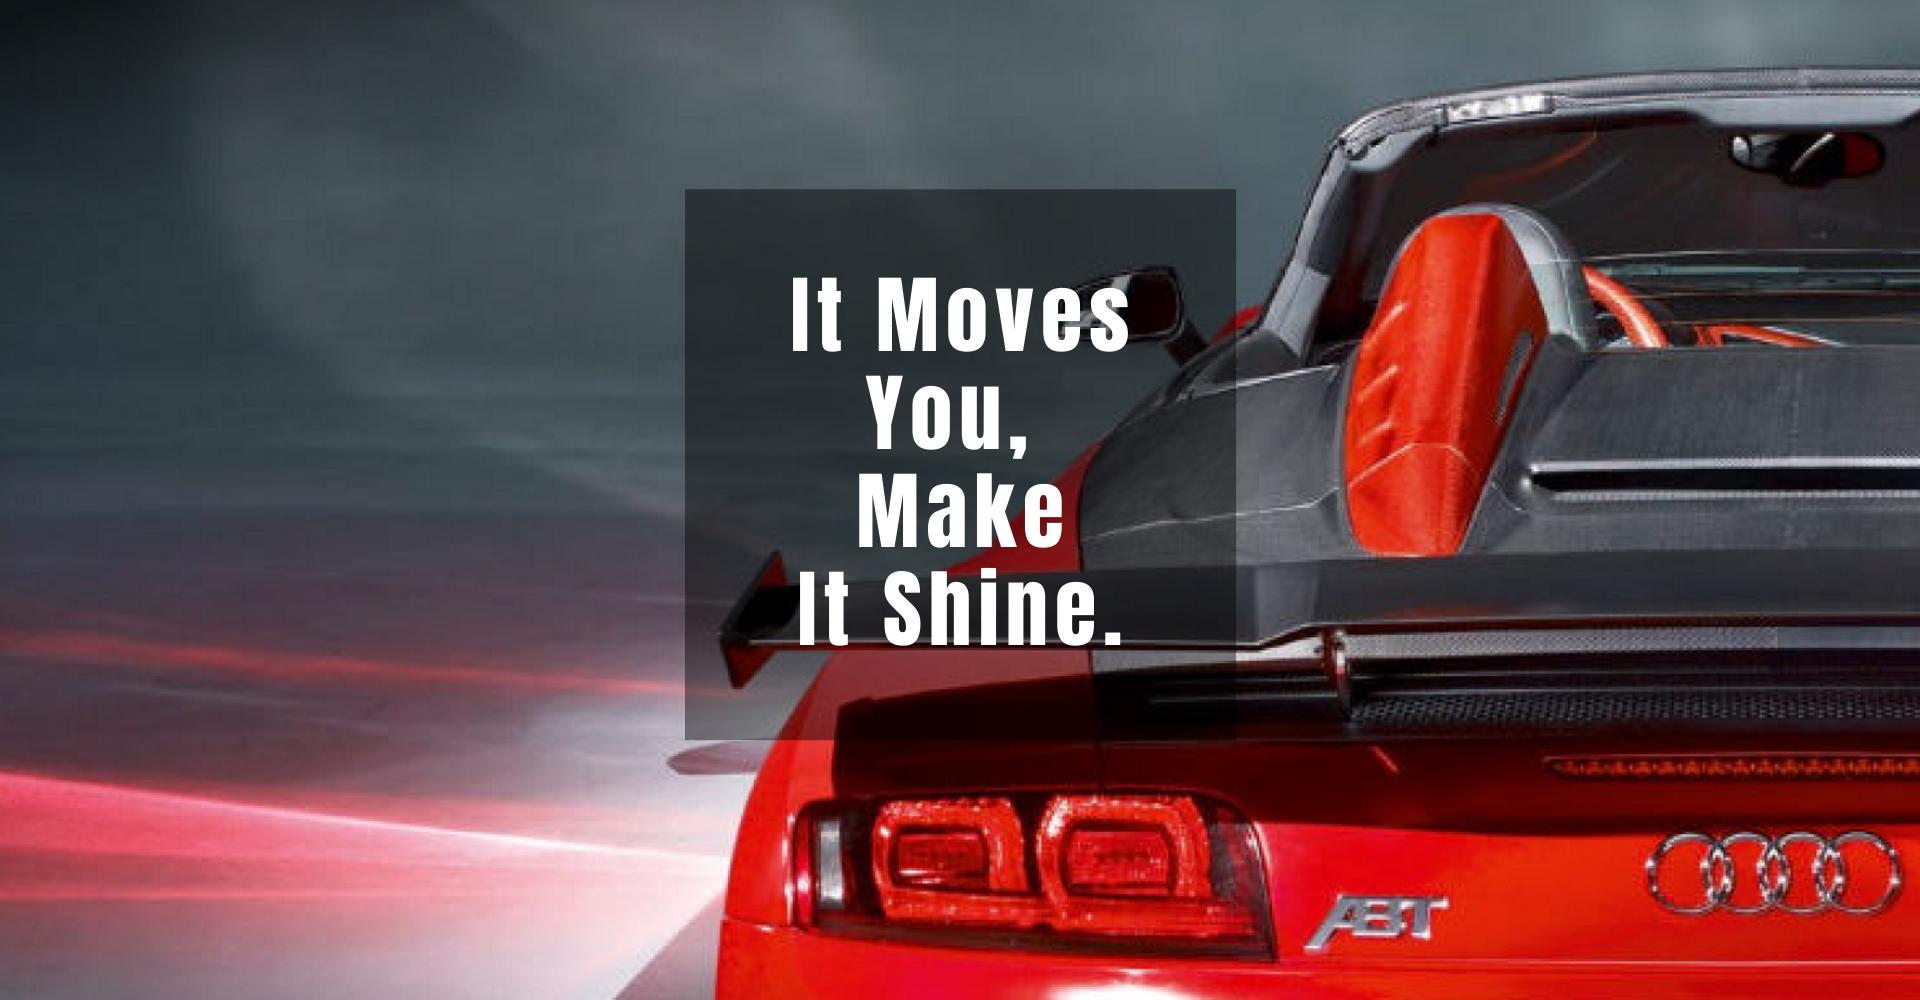 It Moves You, Make It Shine